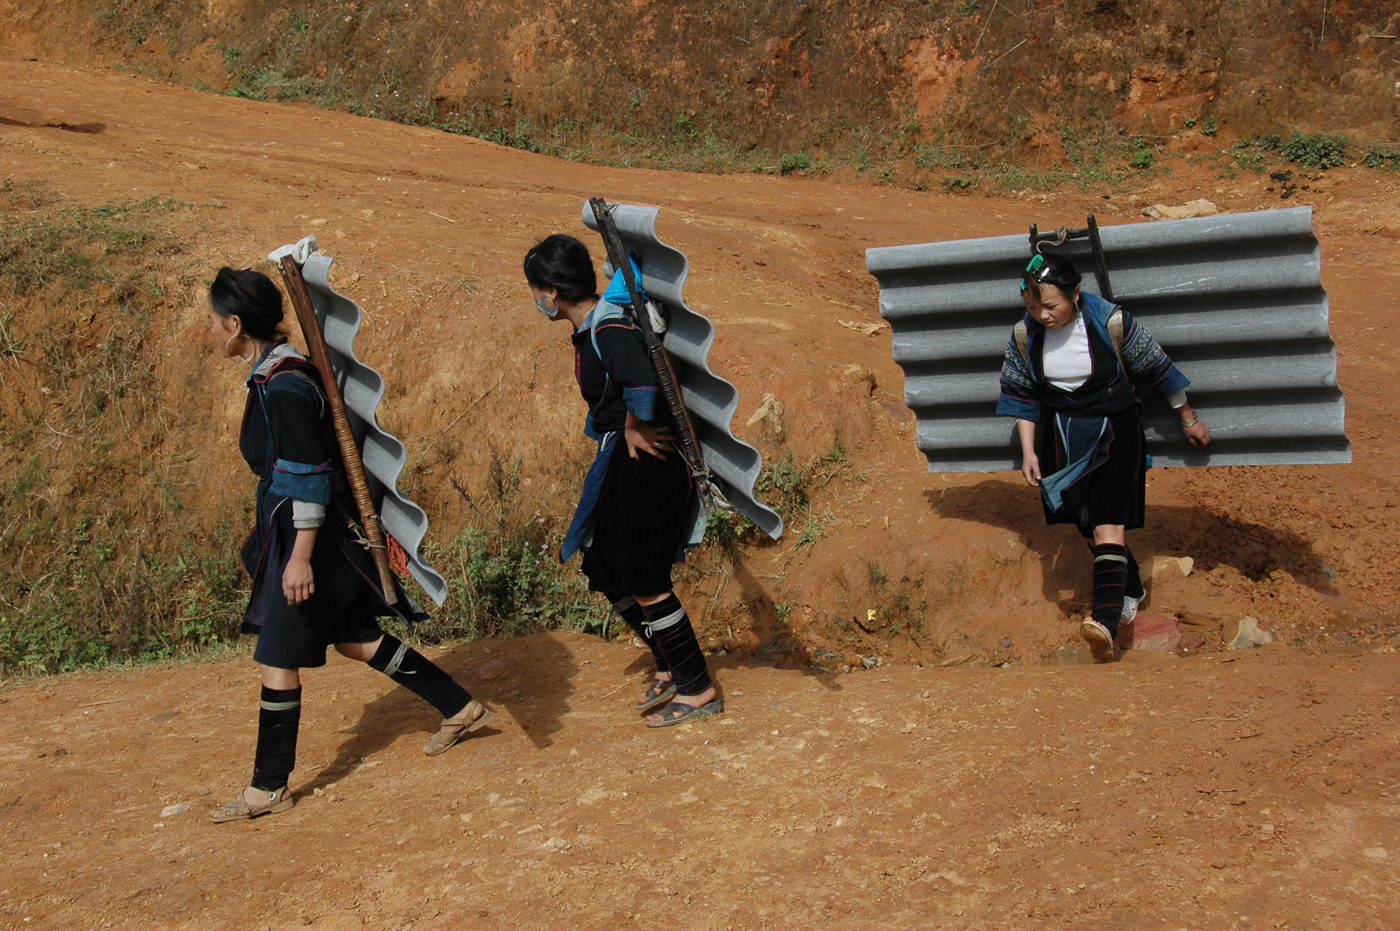 Vietnam, Black Hmongs omgeving Sapa